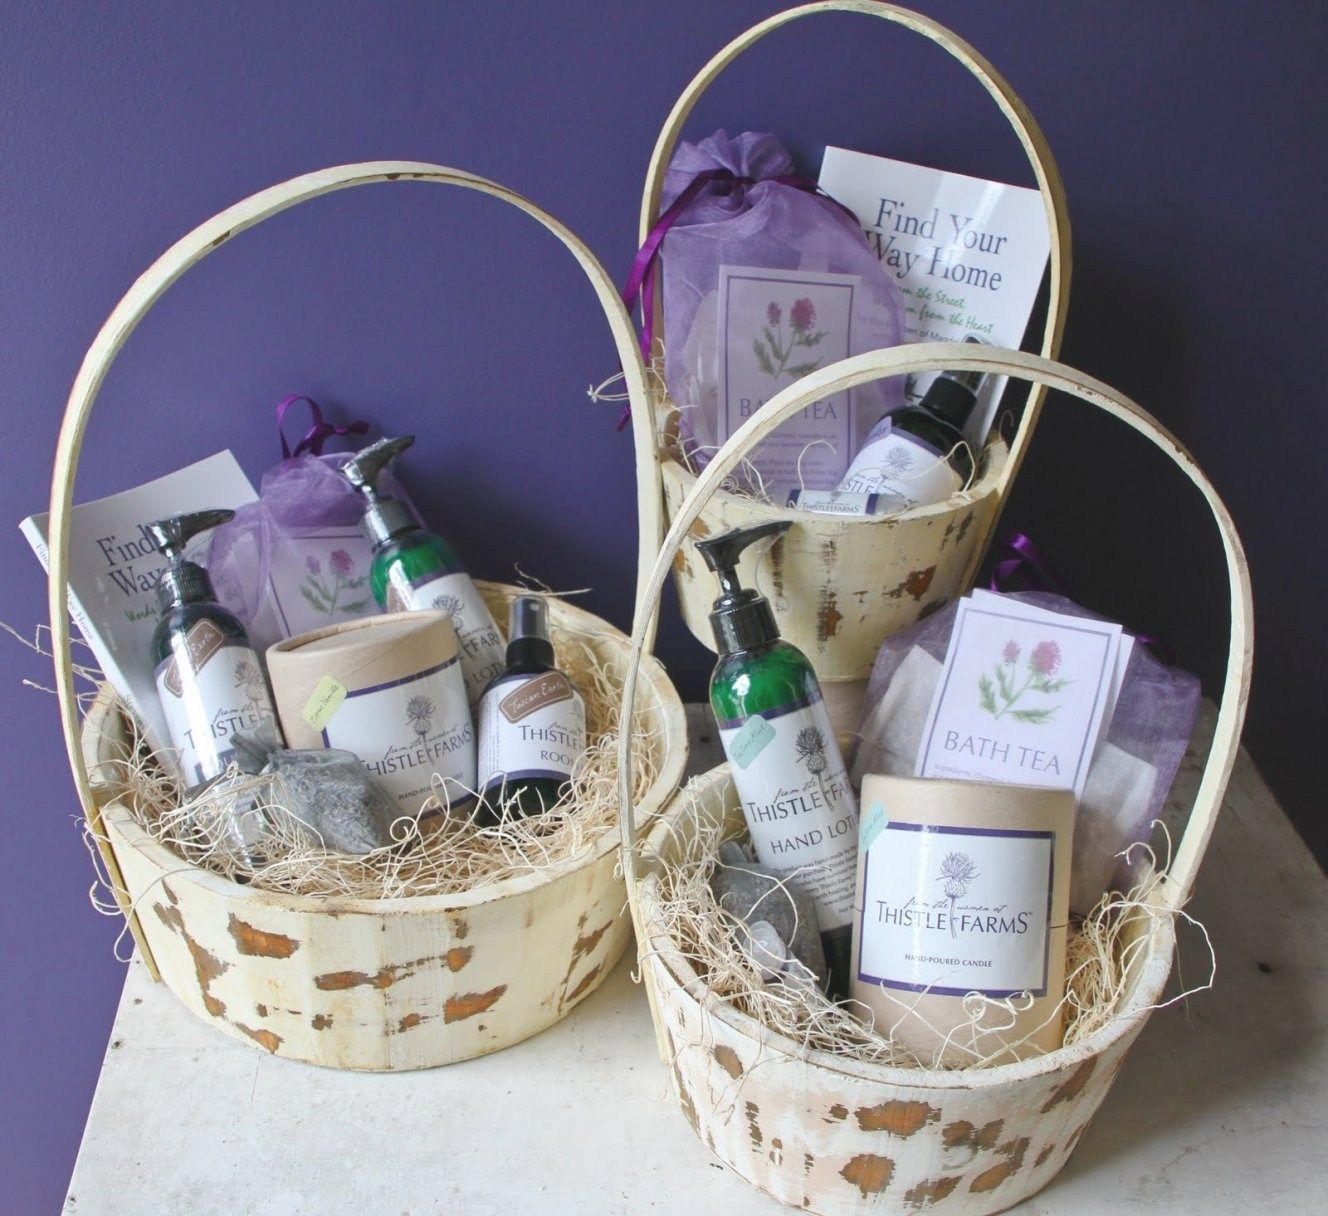 30 Best Wedding Gift Baskets For Bride